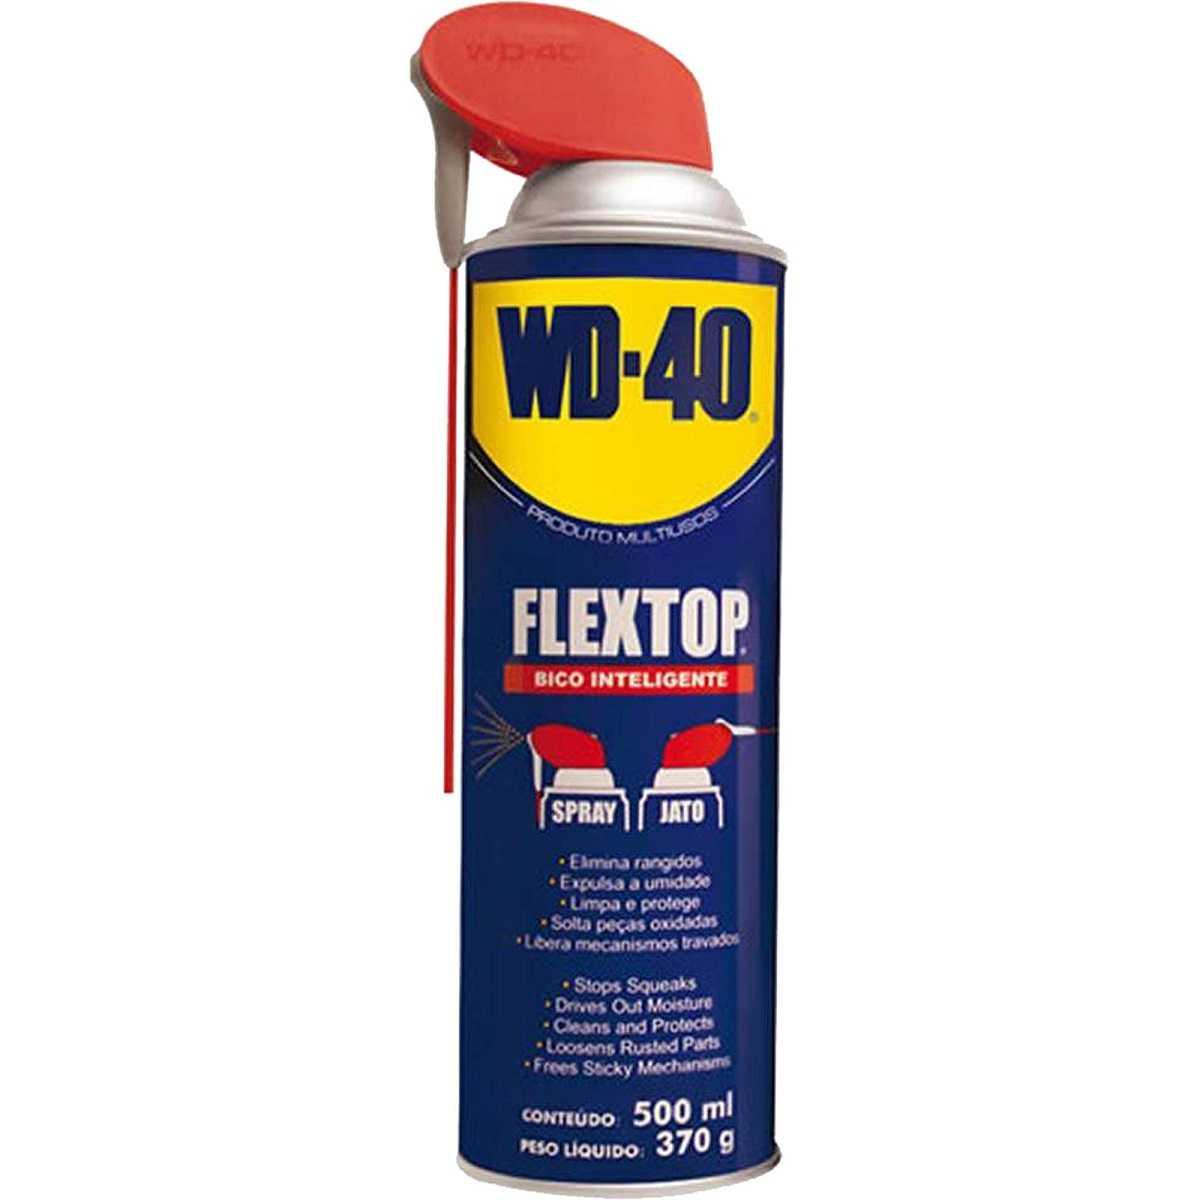 Lubrificante e Desengripante Aerosol 500ml FLEX TOP Spray WD40